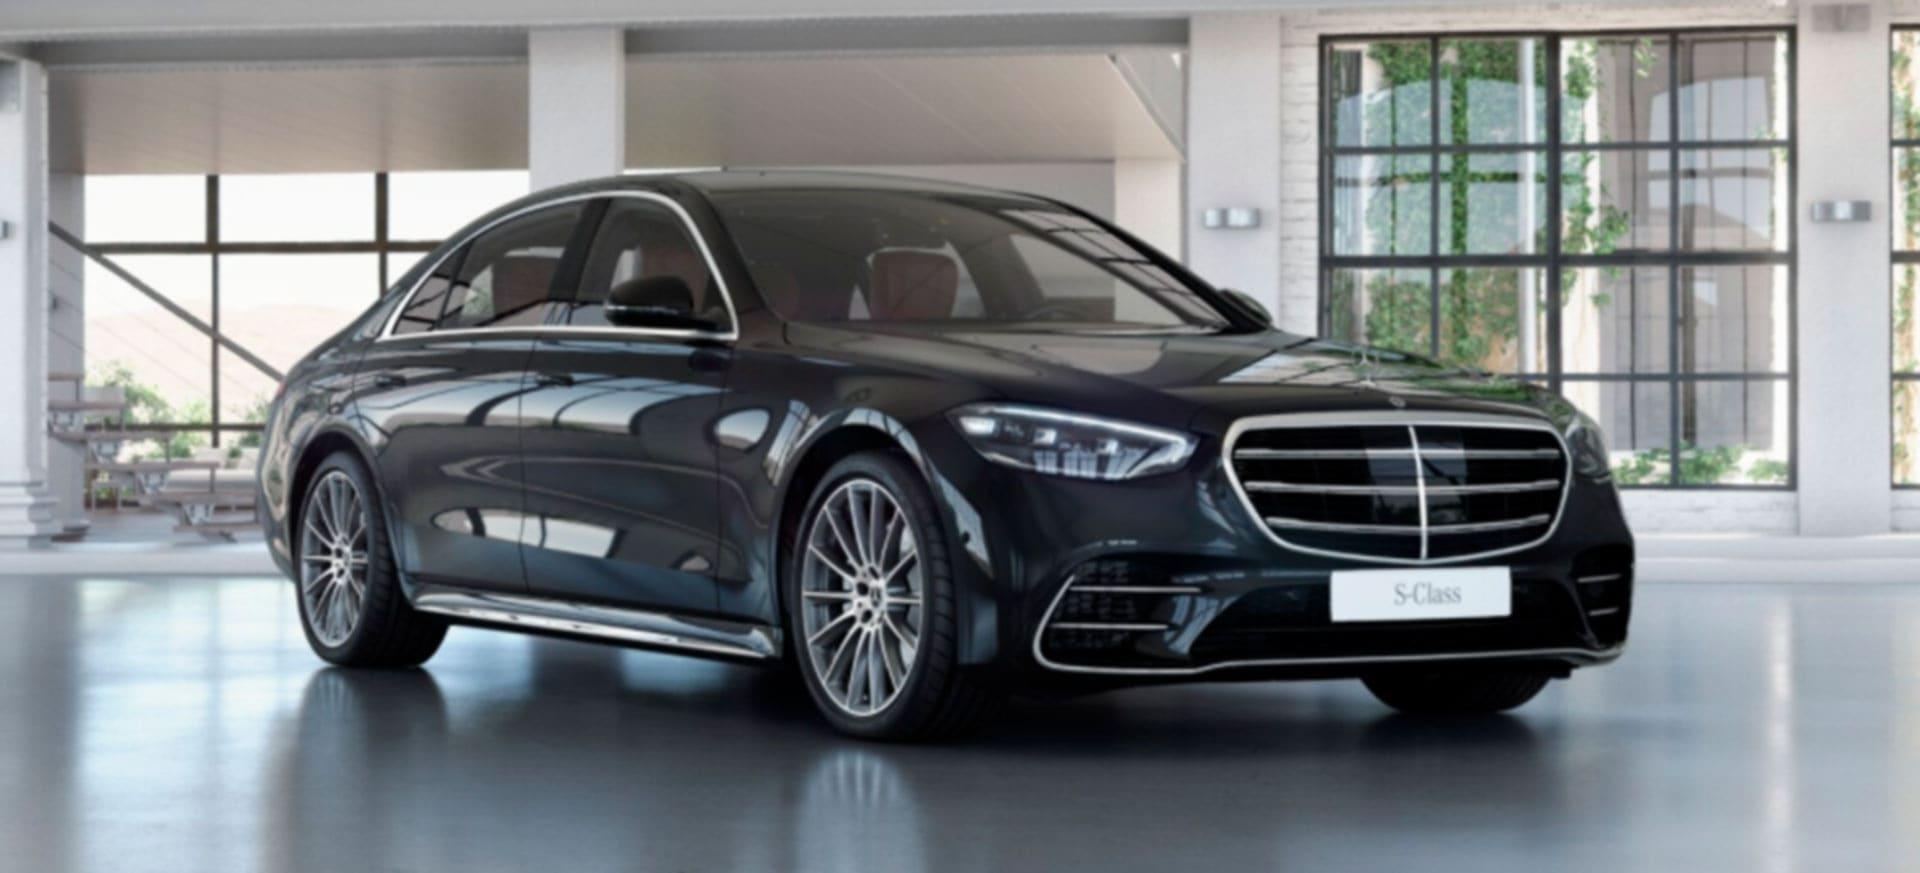 Mercedes-Benz S-Class Limousine 0152600351